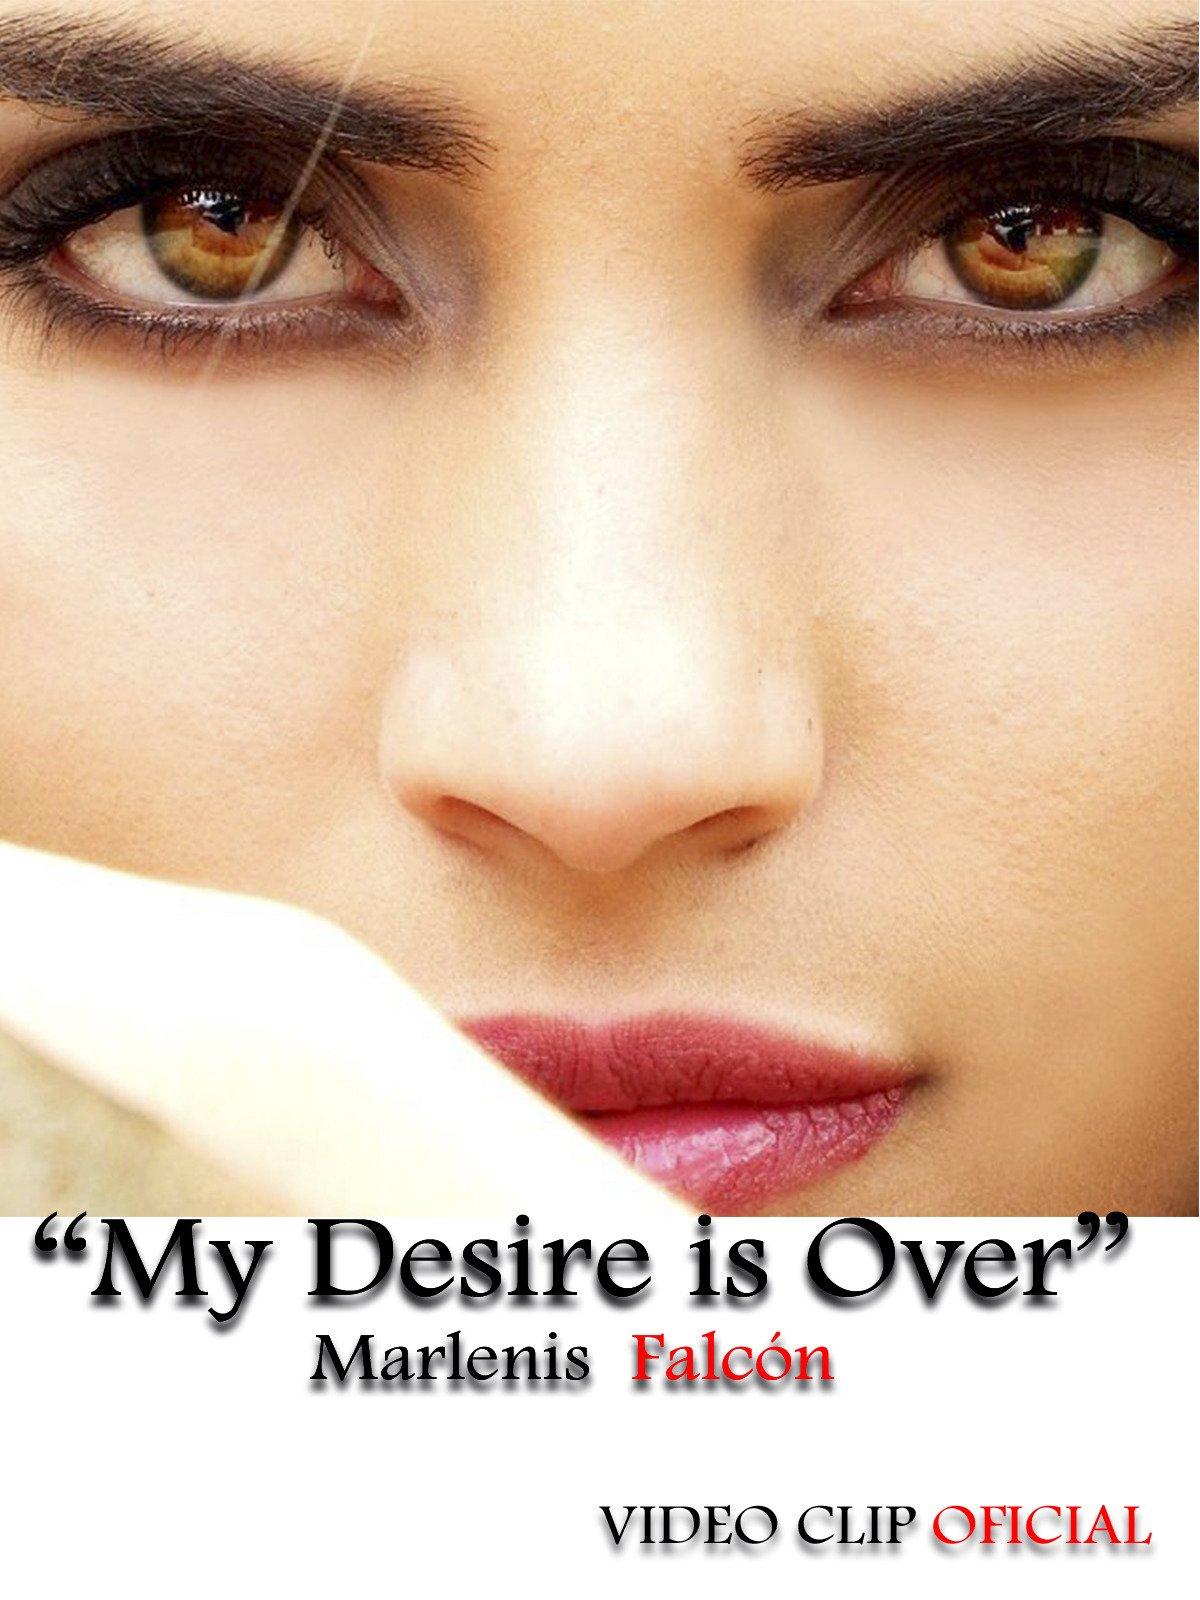 My Desire is Over